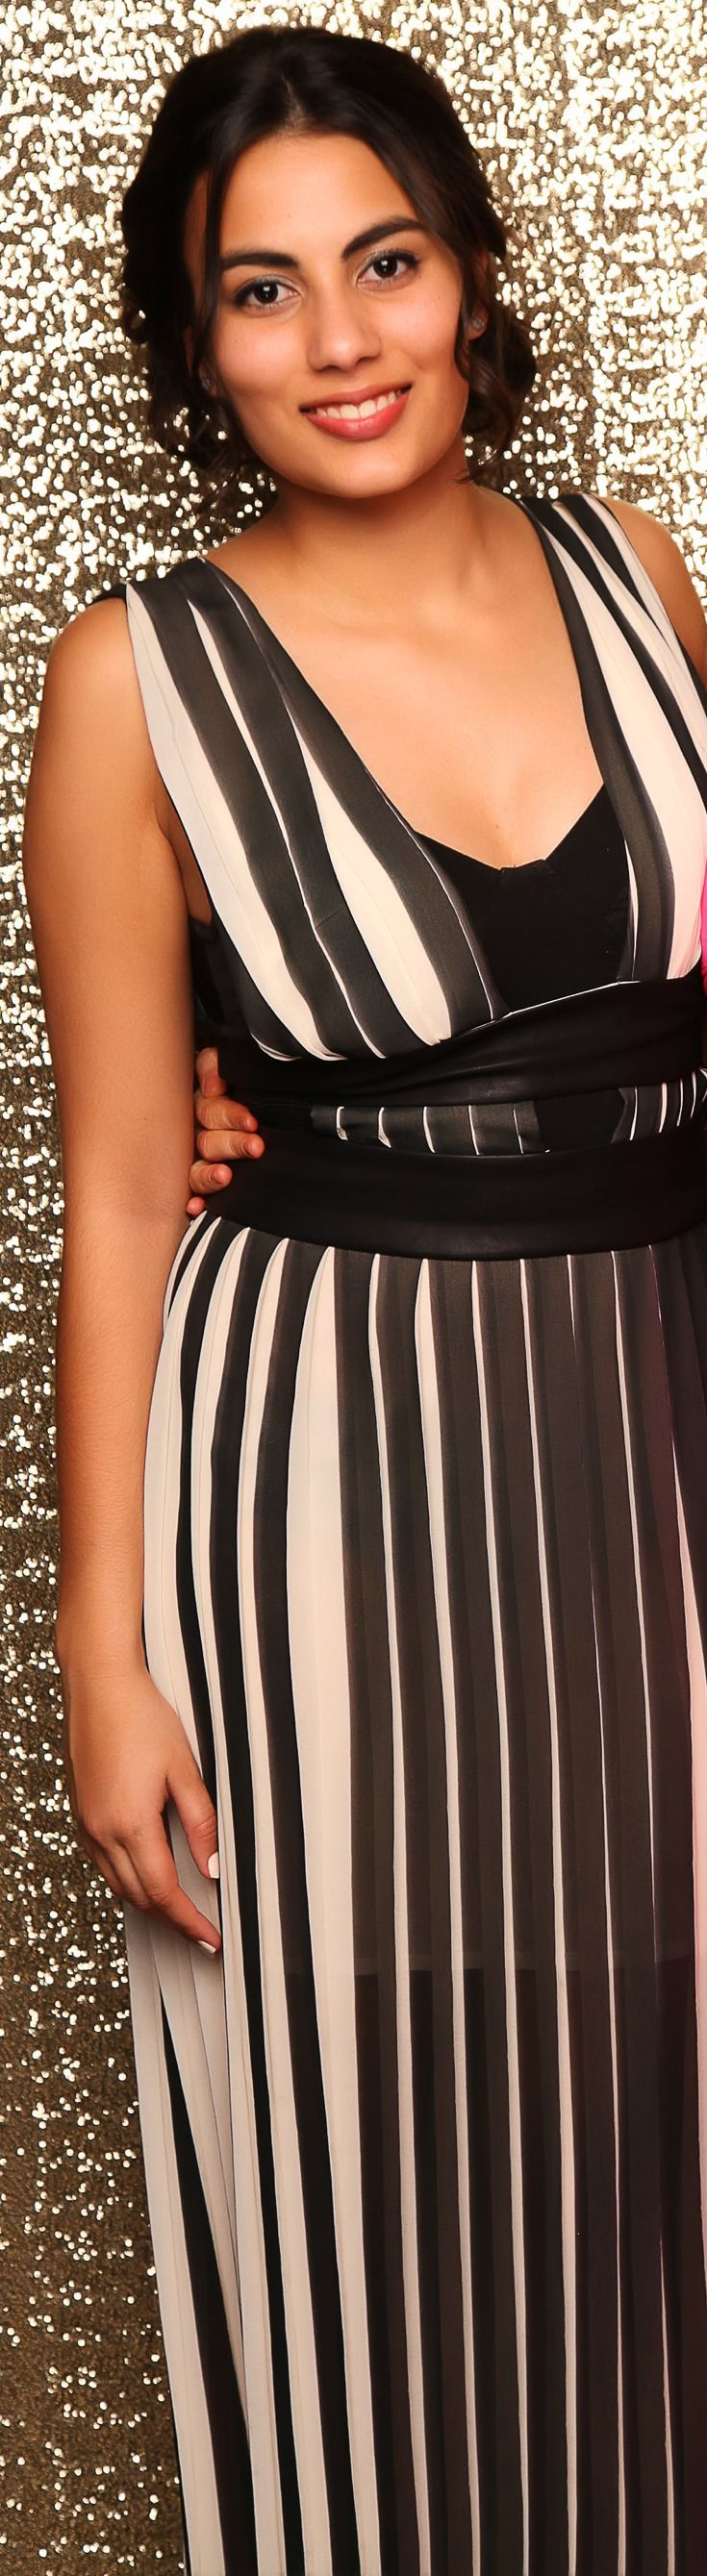 AULSS Ball 2014. Stunning in stripes! www.whitedoor.co.nz